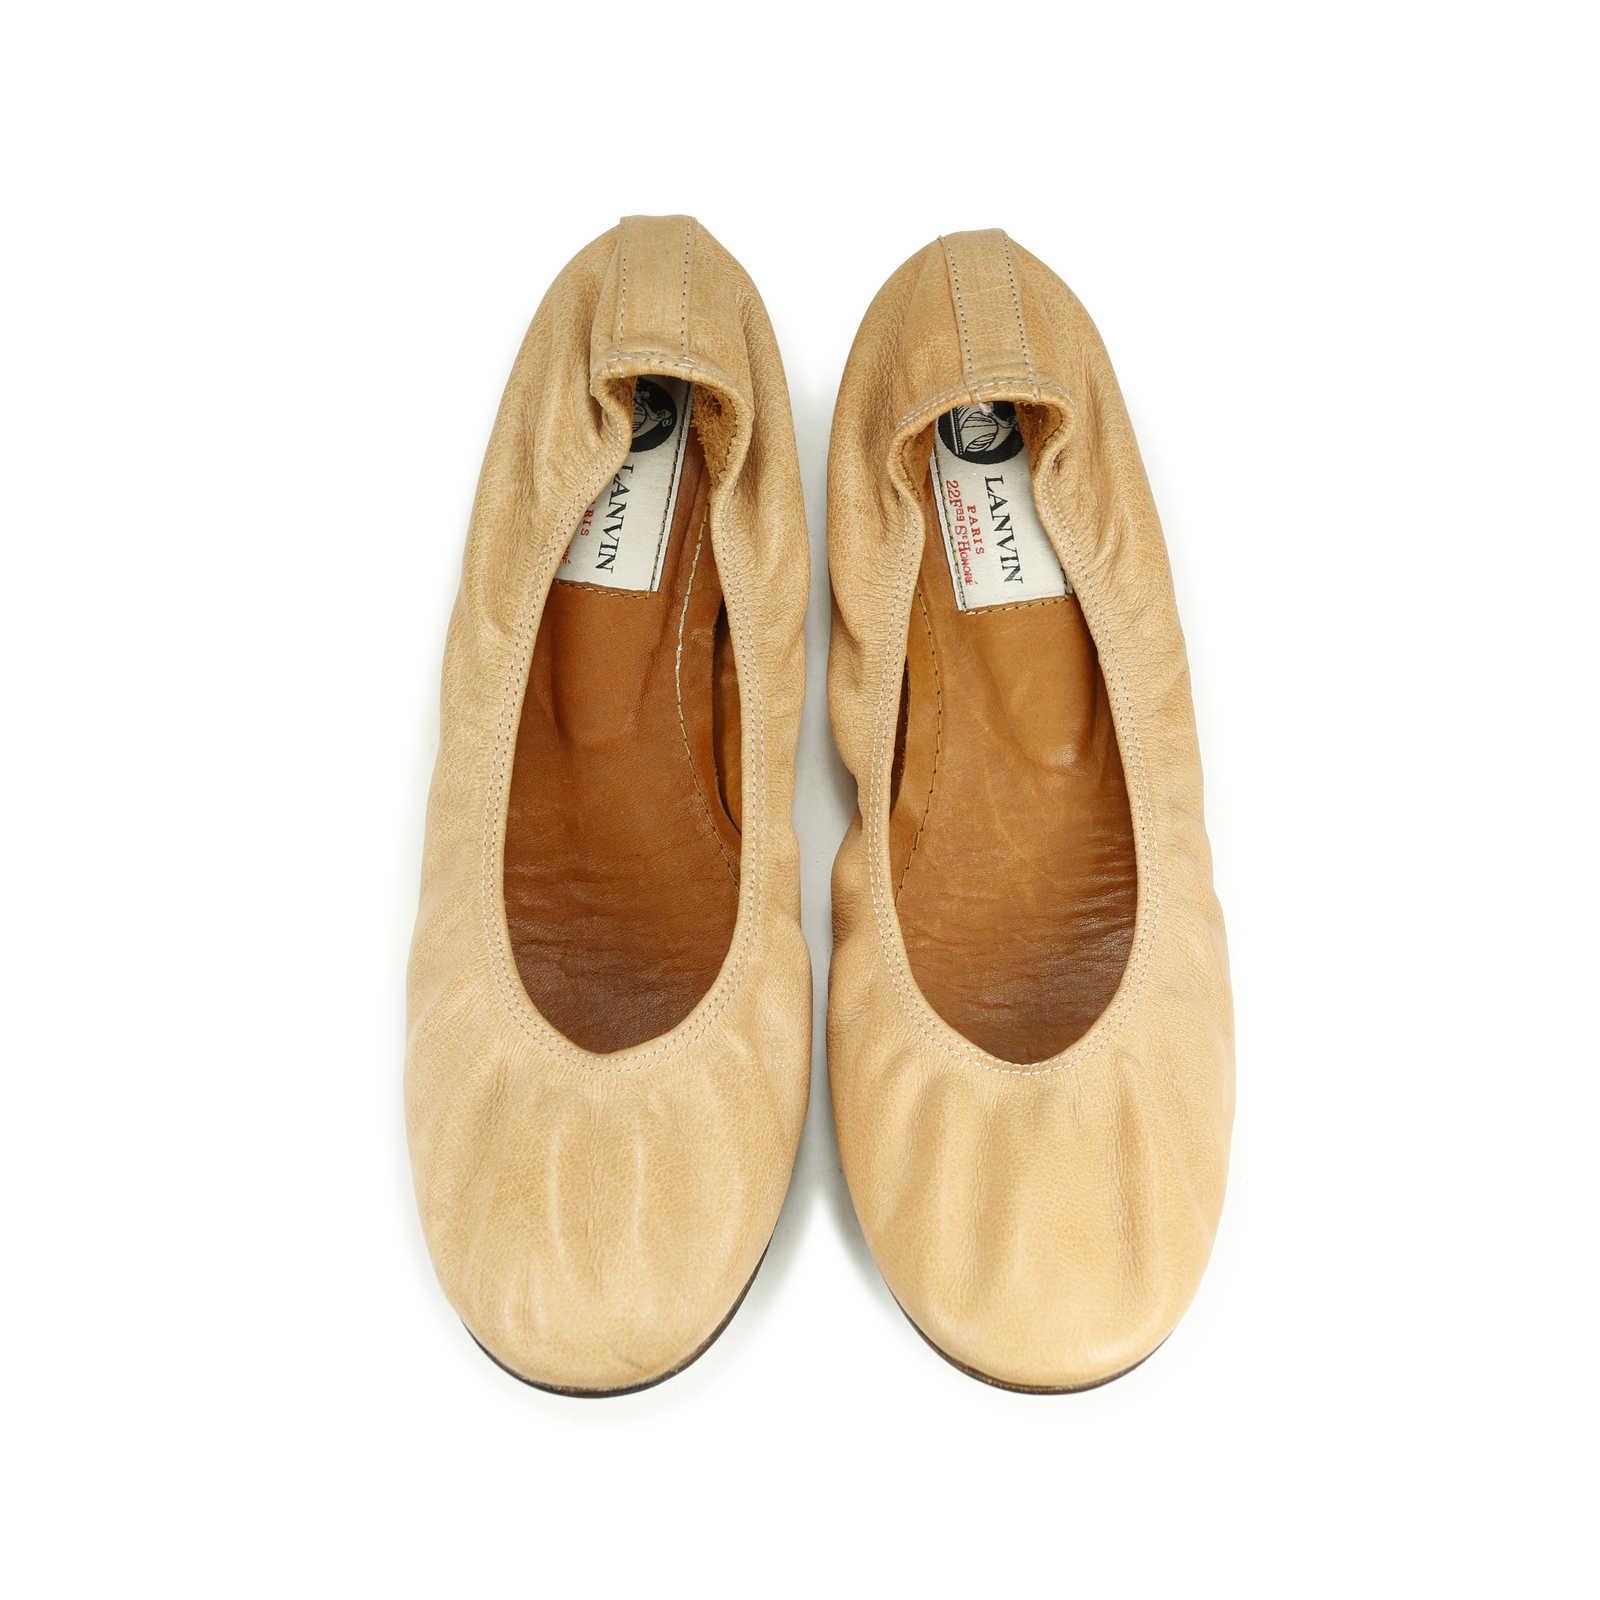 lanvin-classic-leather-ballet-flats-pss-193-00028-1.jpg